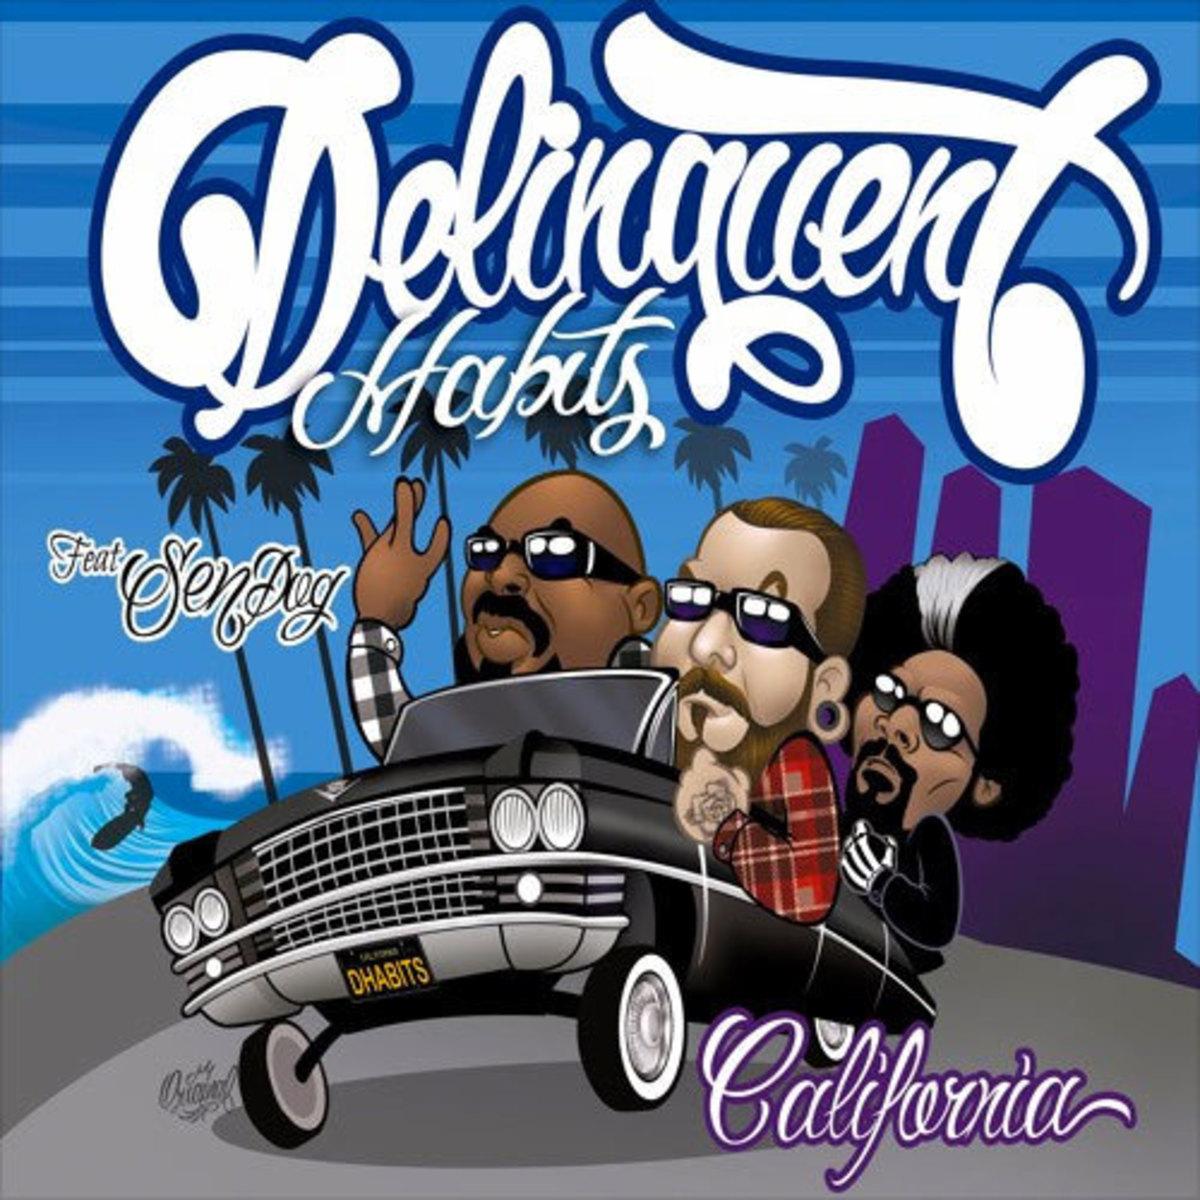 delinquent-habits-california.jpg